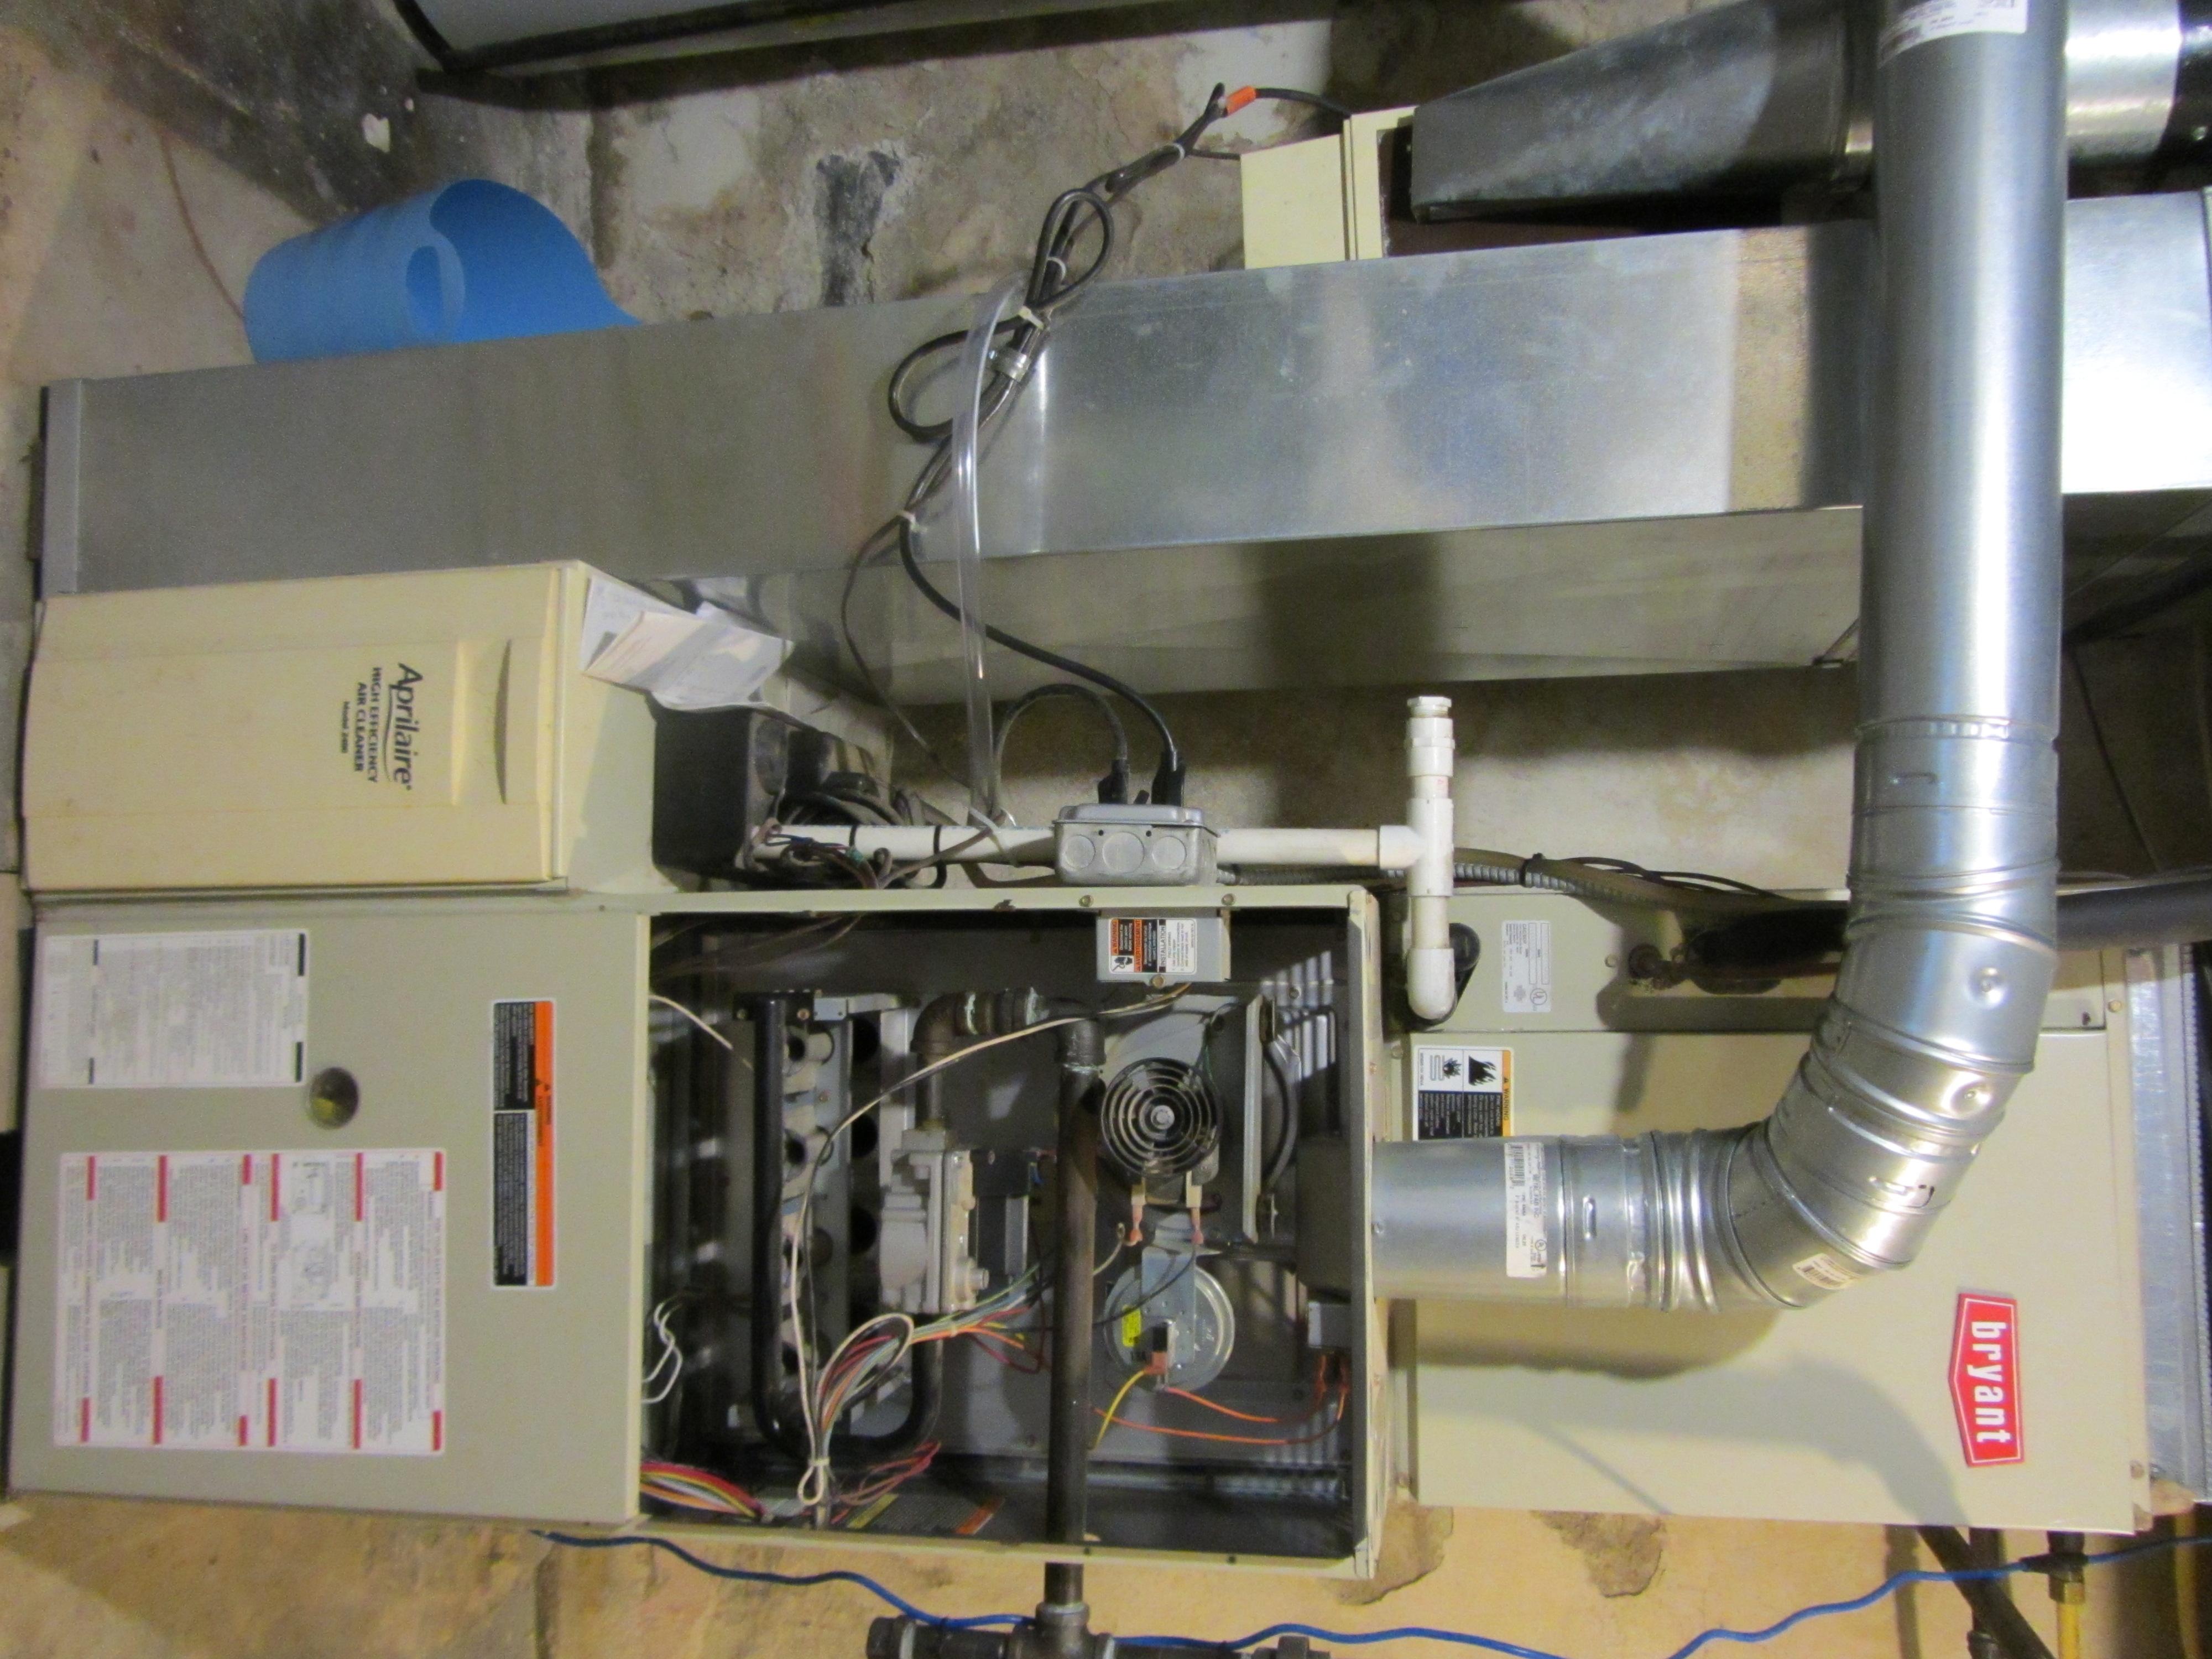 Concord Heat Pump Wiring Diagram : Bryant plus t furnace parts diagram repair wiring scheme